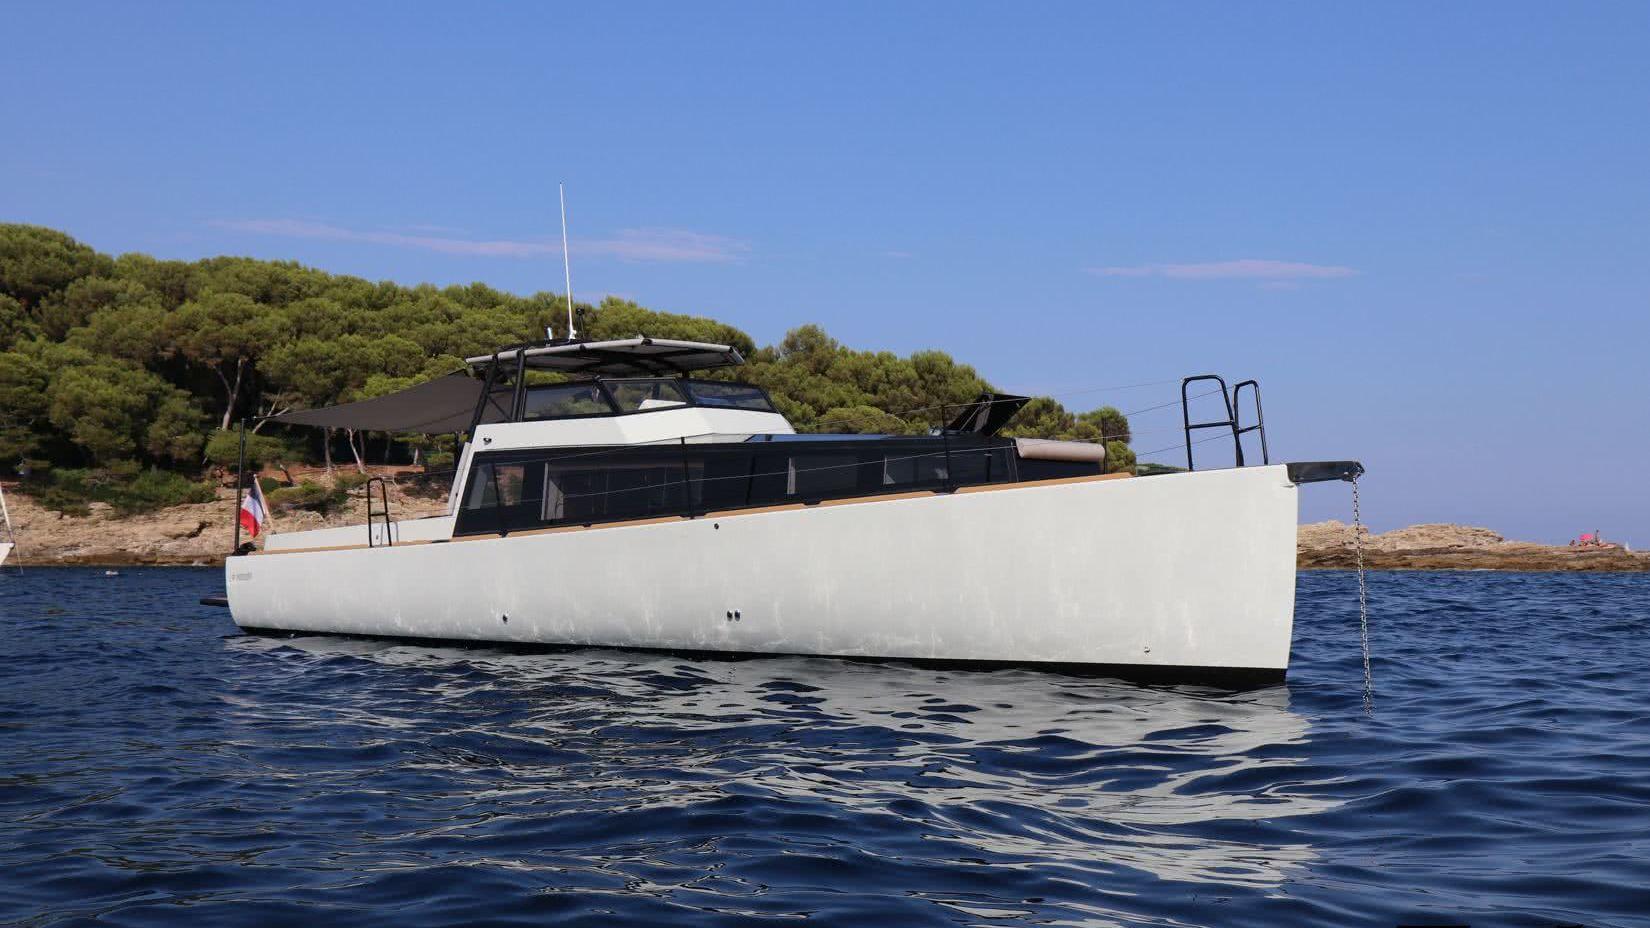 Silverfin Yacht Turbocraft